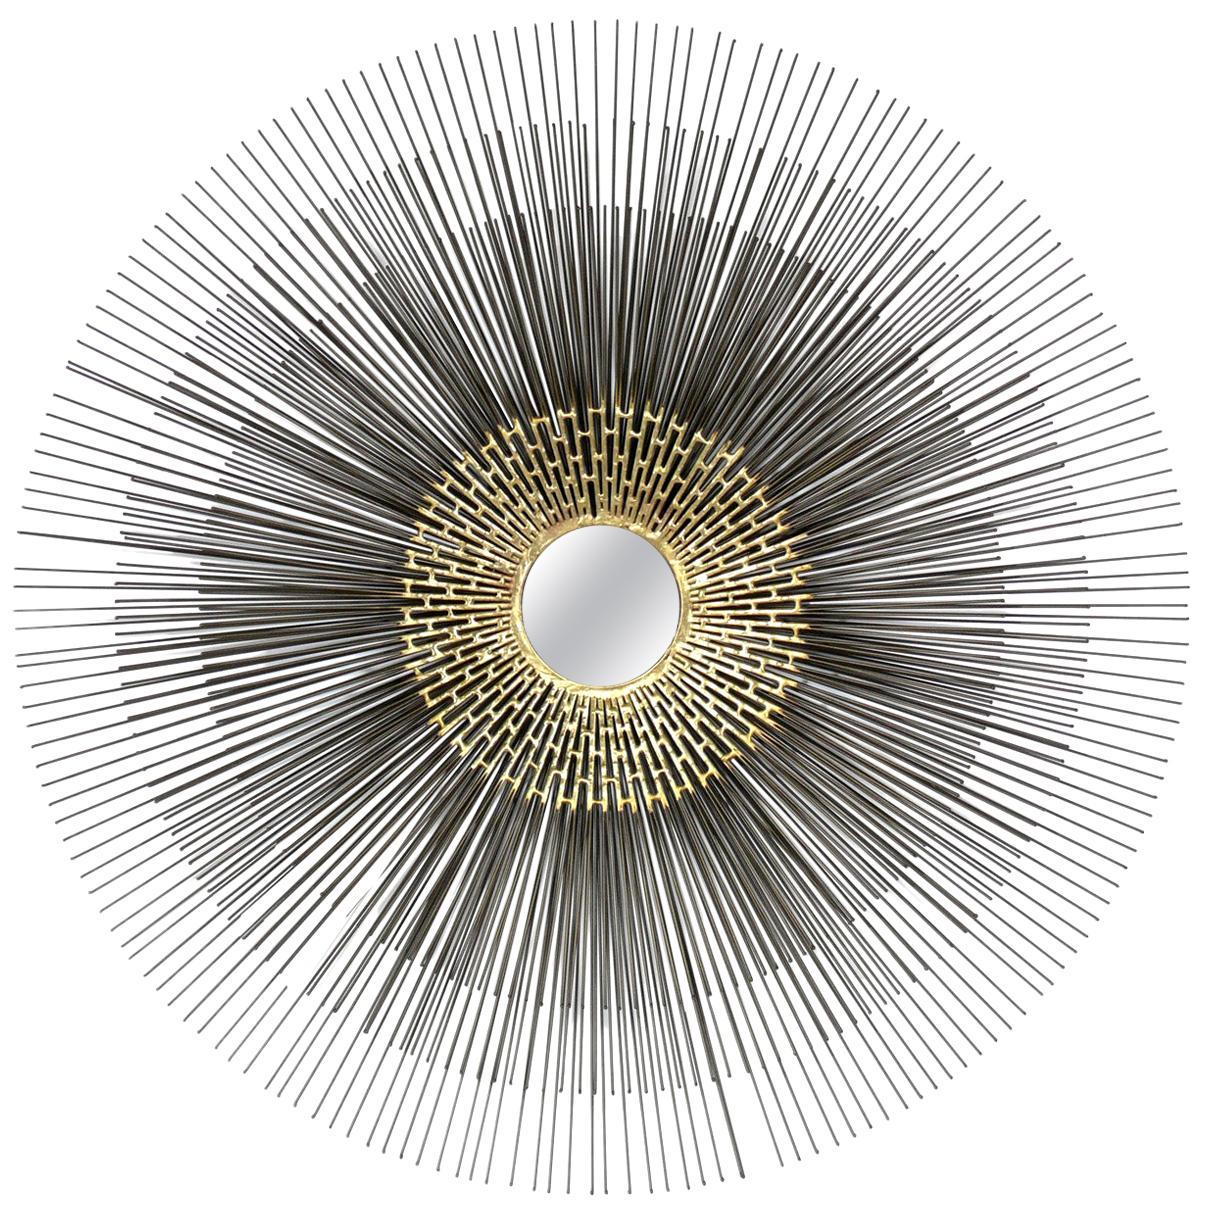 Sunburst Mirror or Wall Sculpture